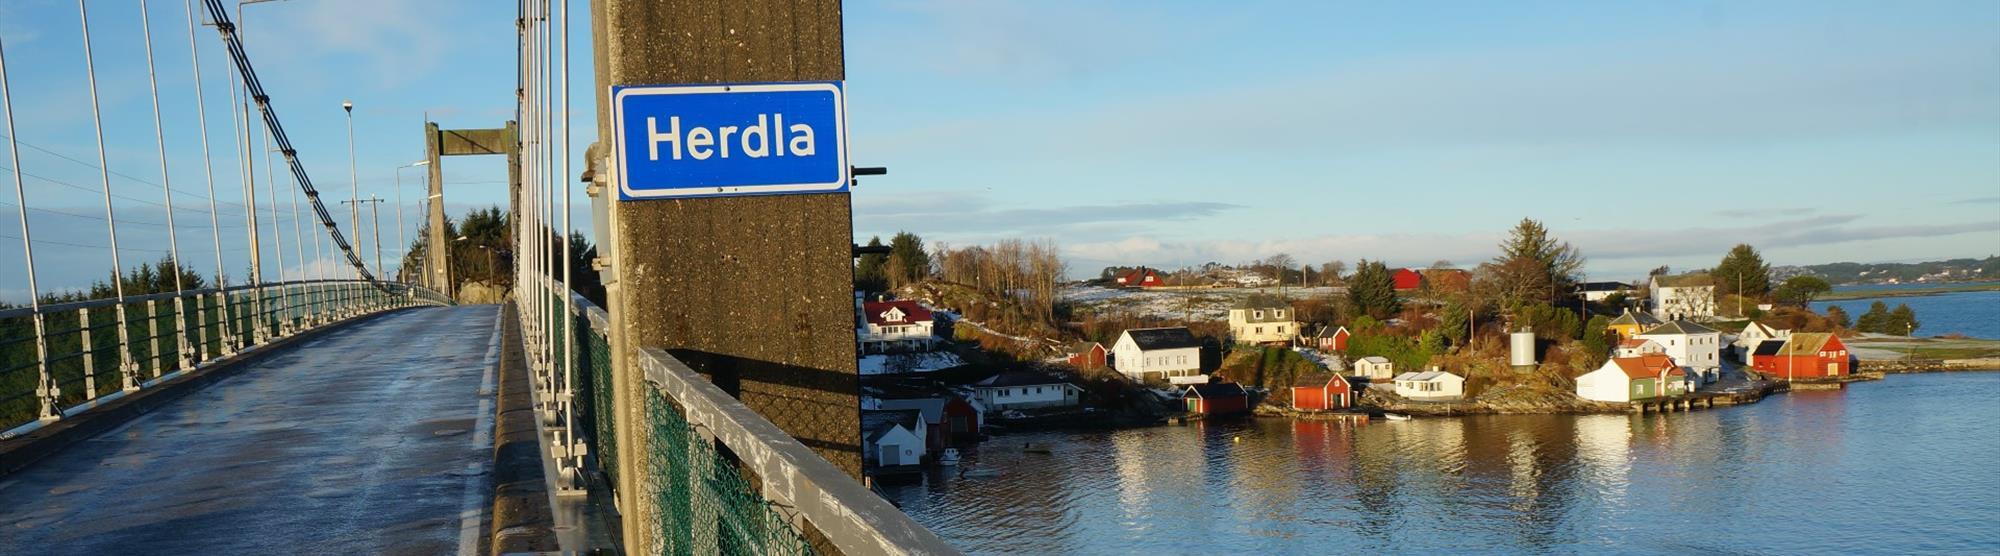 Road trip from Bergen to Herdla